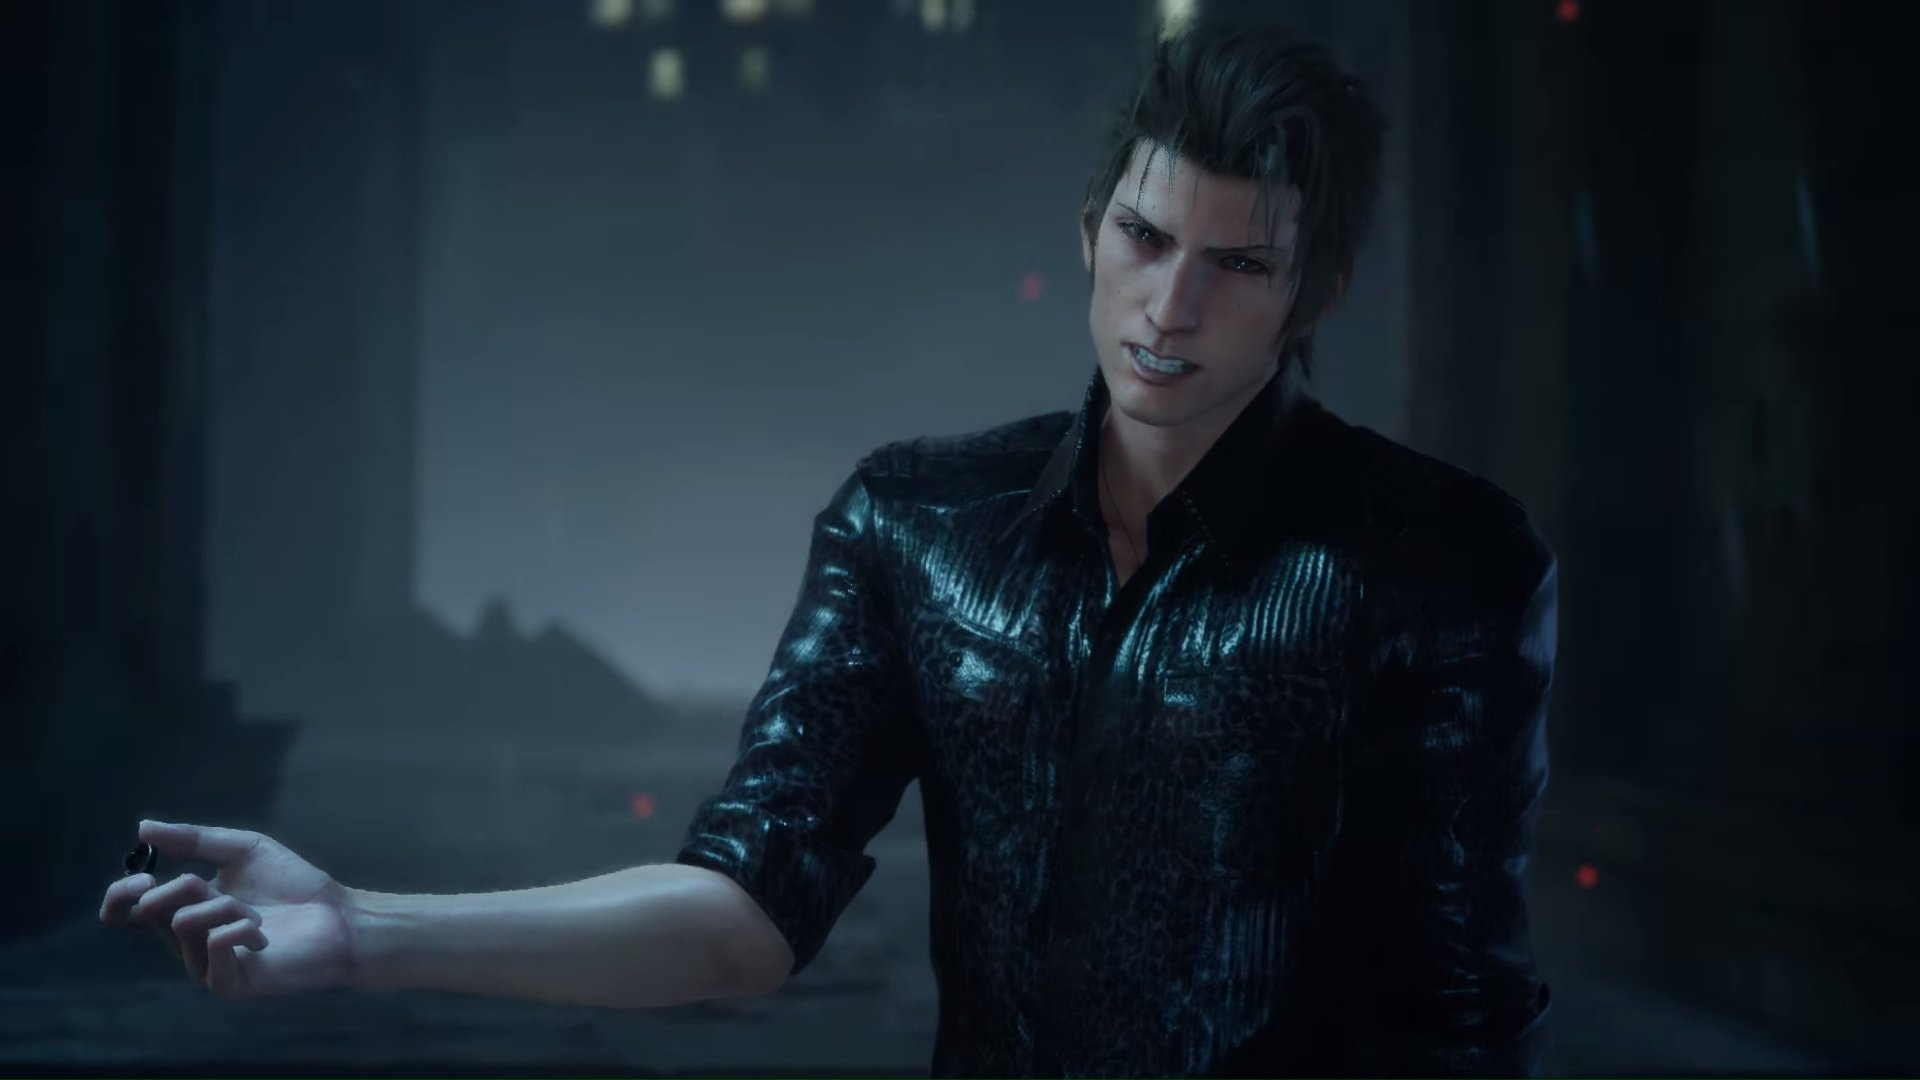 Final Fantasy Xv Episode Ignis Coming December 13th